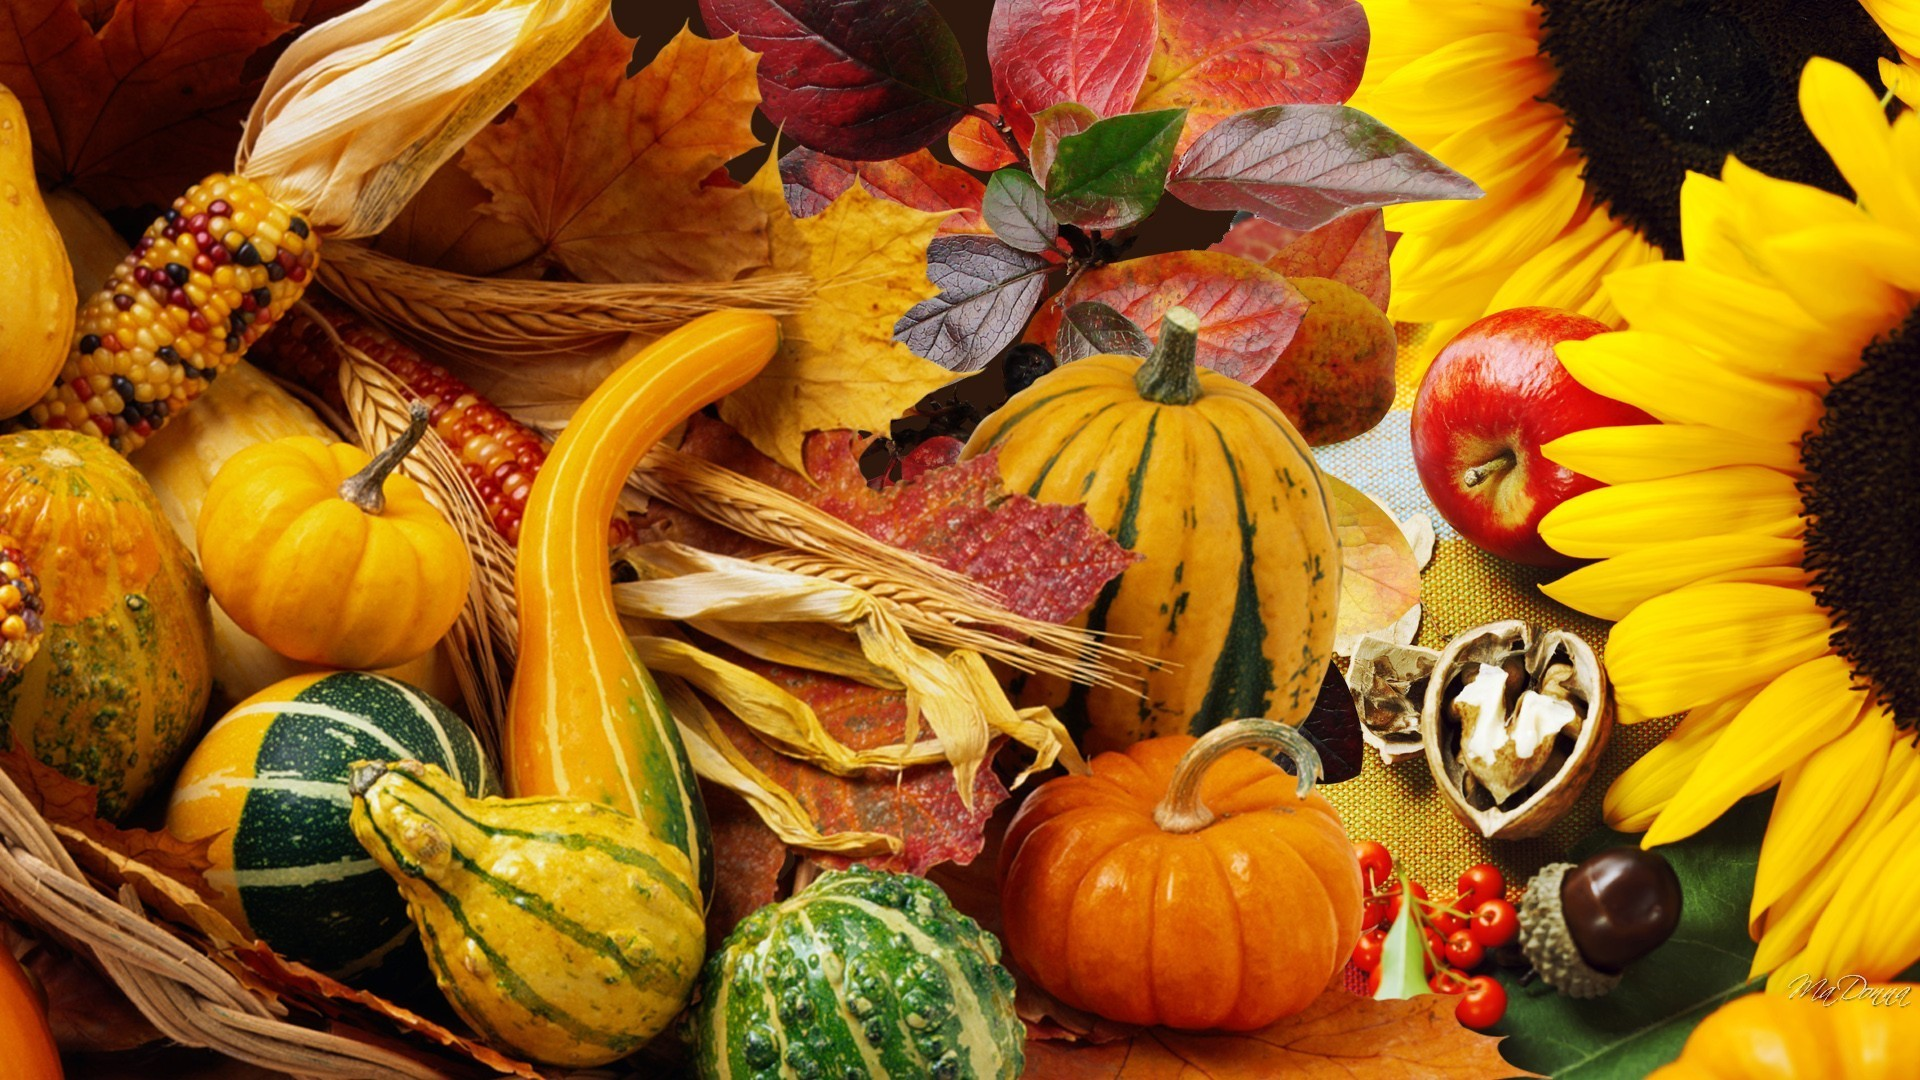 Fall Harvest Iphone Wallpaper Wallpaper Thanksgiving 72 Images